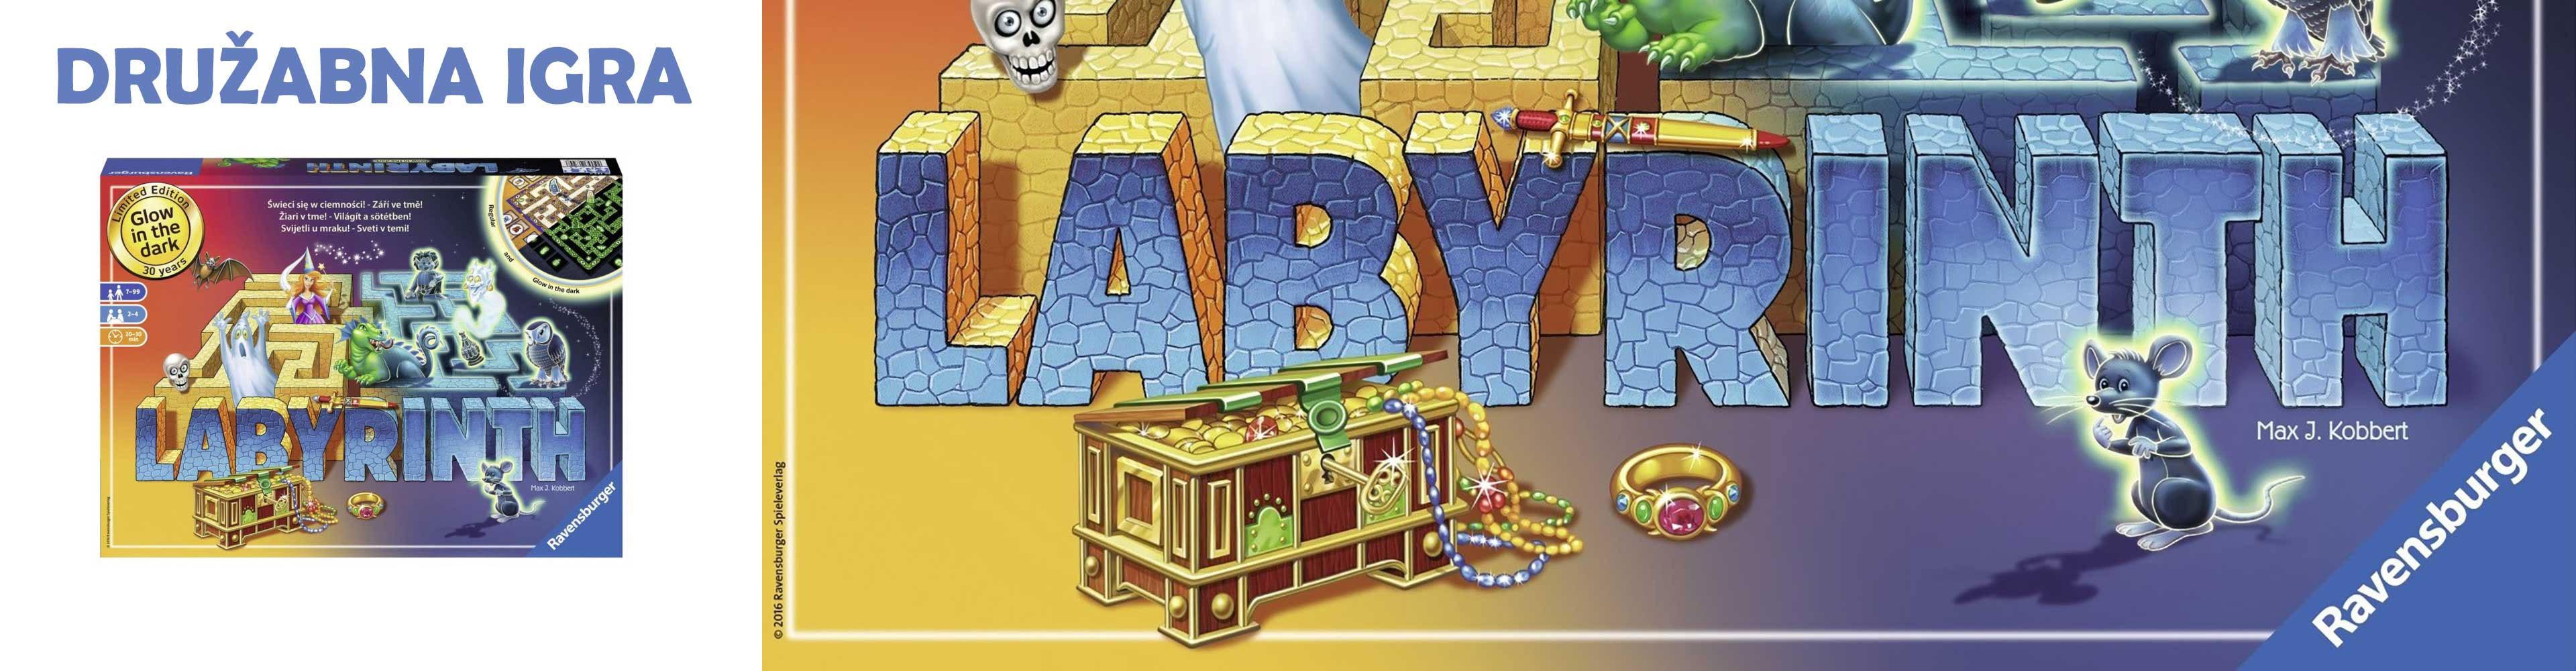 Labirint igra